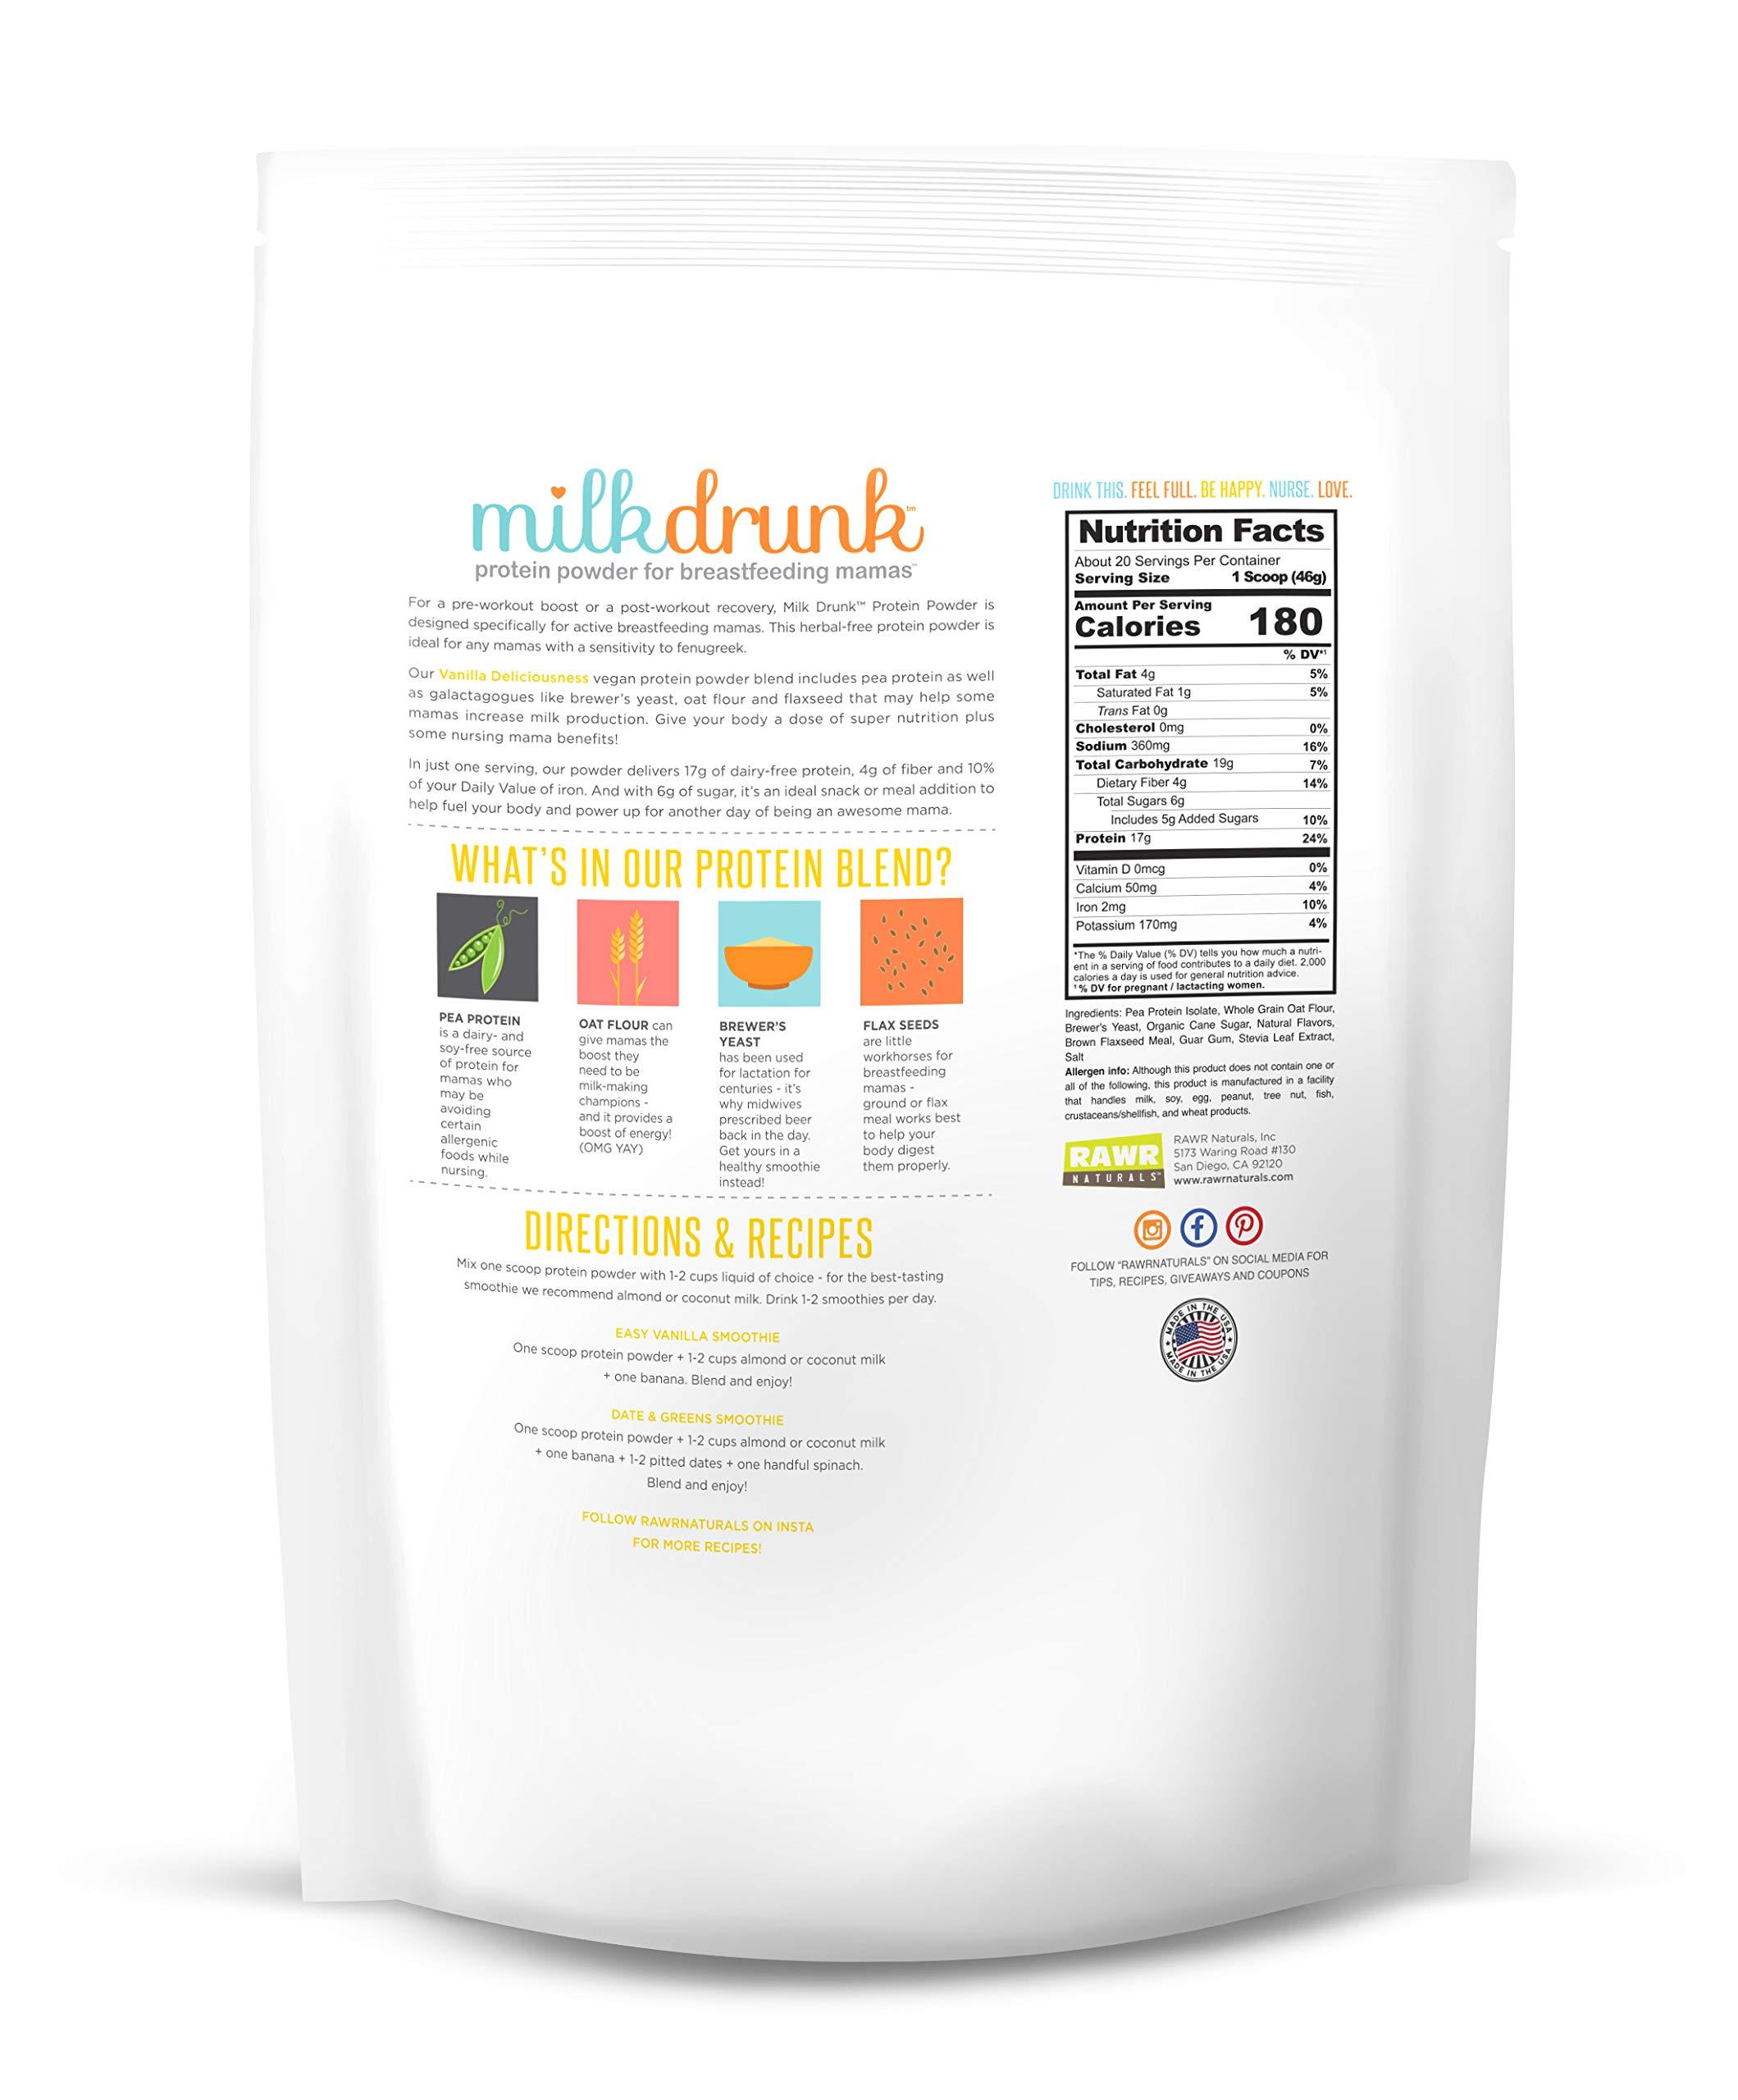 3 Bag Fenugreek-Free Variety Pack - Milk Drunk Protein Powder for Breastfeeding - 60 Servings Vegan Protein, Lactation-Boosting 17g Protein 4g Fiber 6g Sugar - Oat Flour, Flax, Brewer's Yeast by Milk Drunk (Image #5)